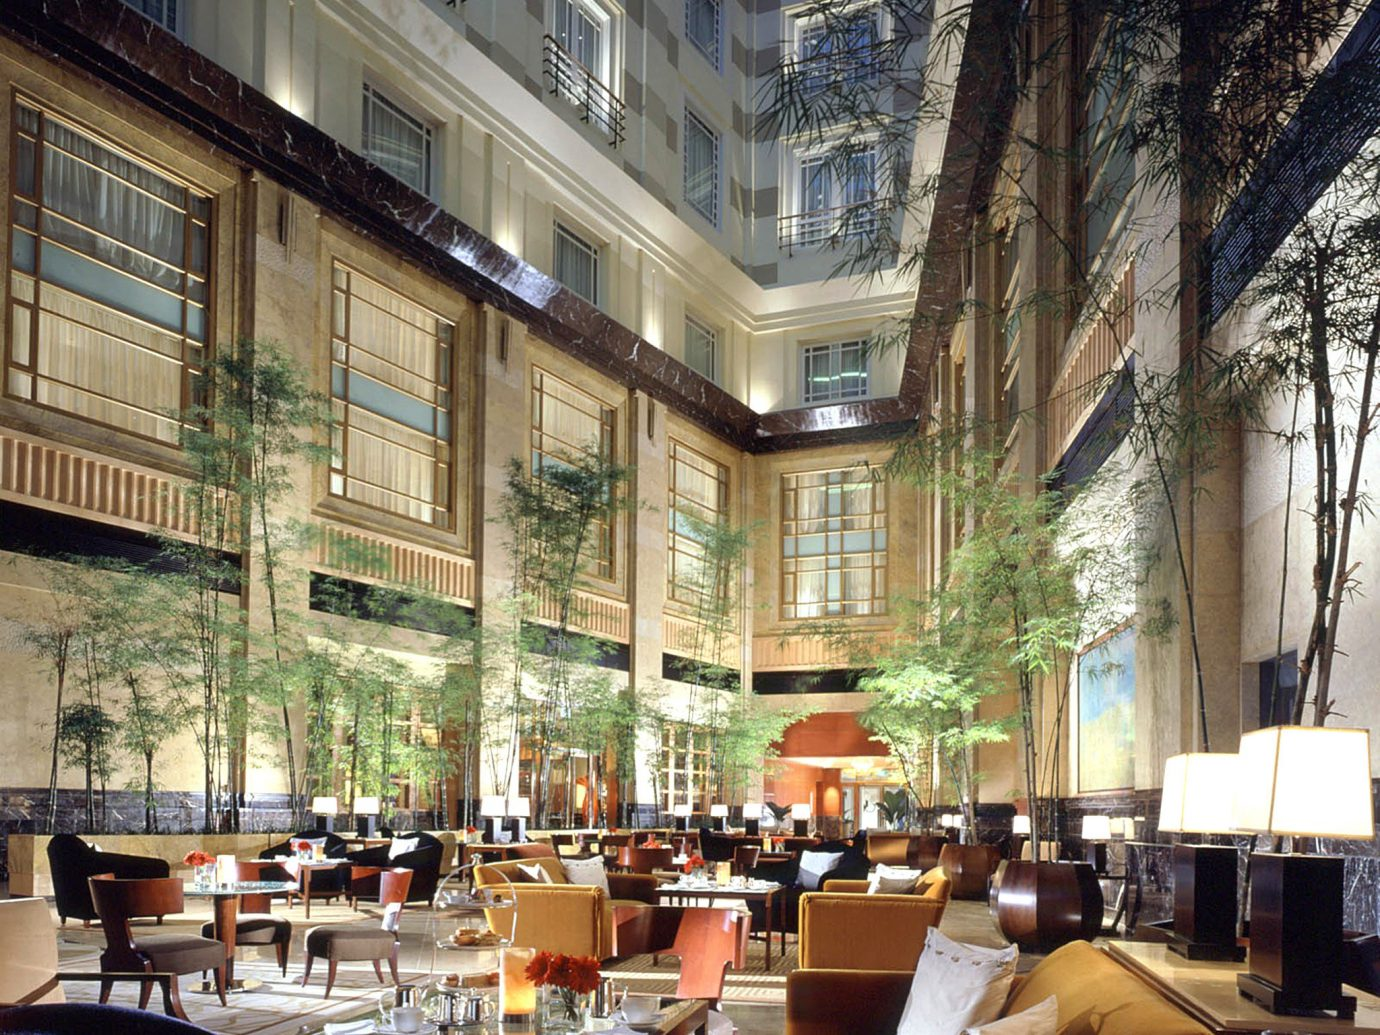 Bar Dining Drink Eat Hip Hotels Modern Romantic plaza restaurant scene condominium interior design dining room